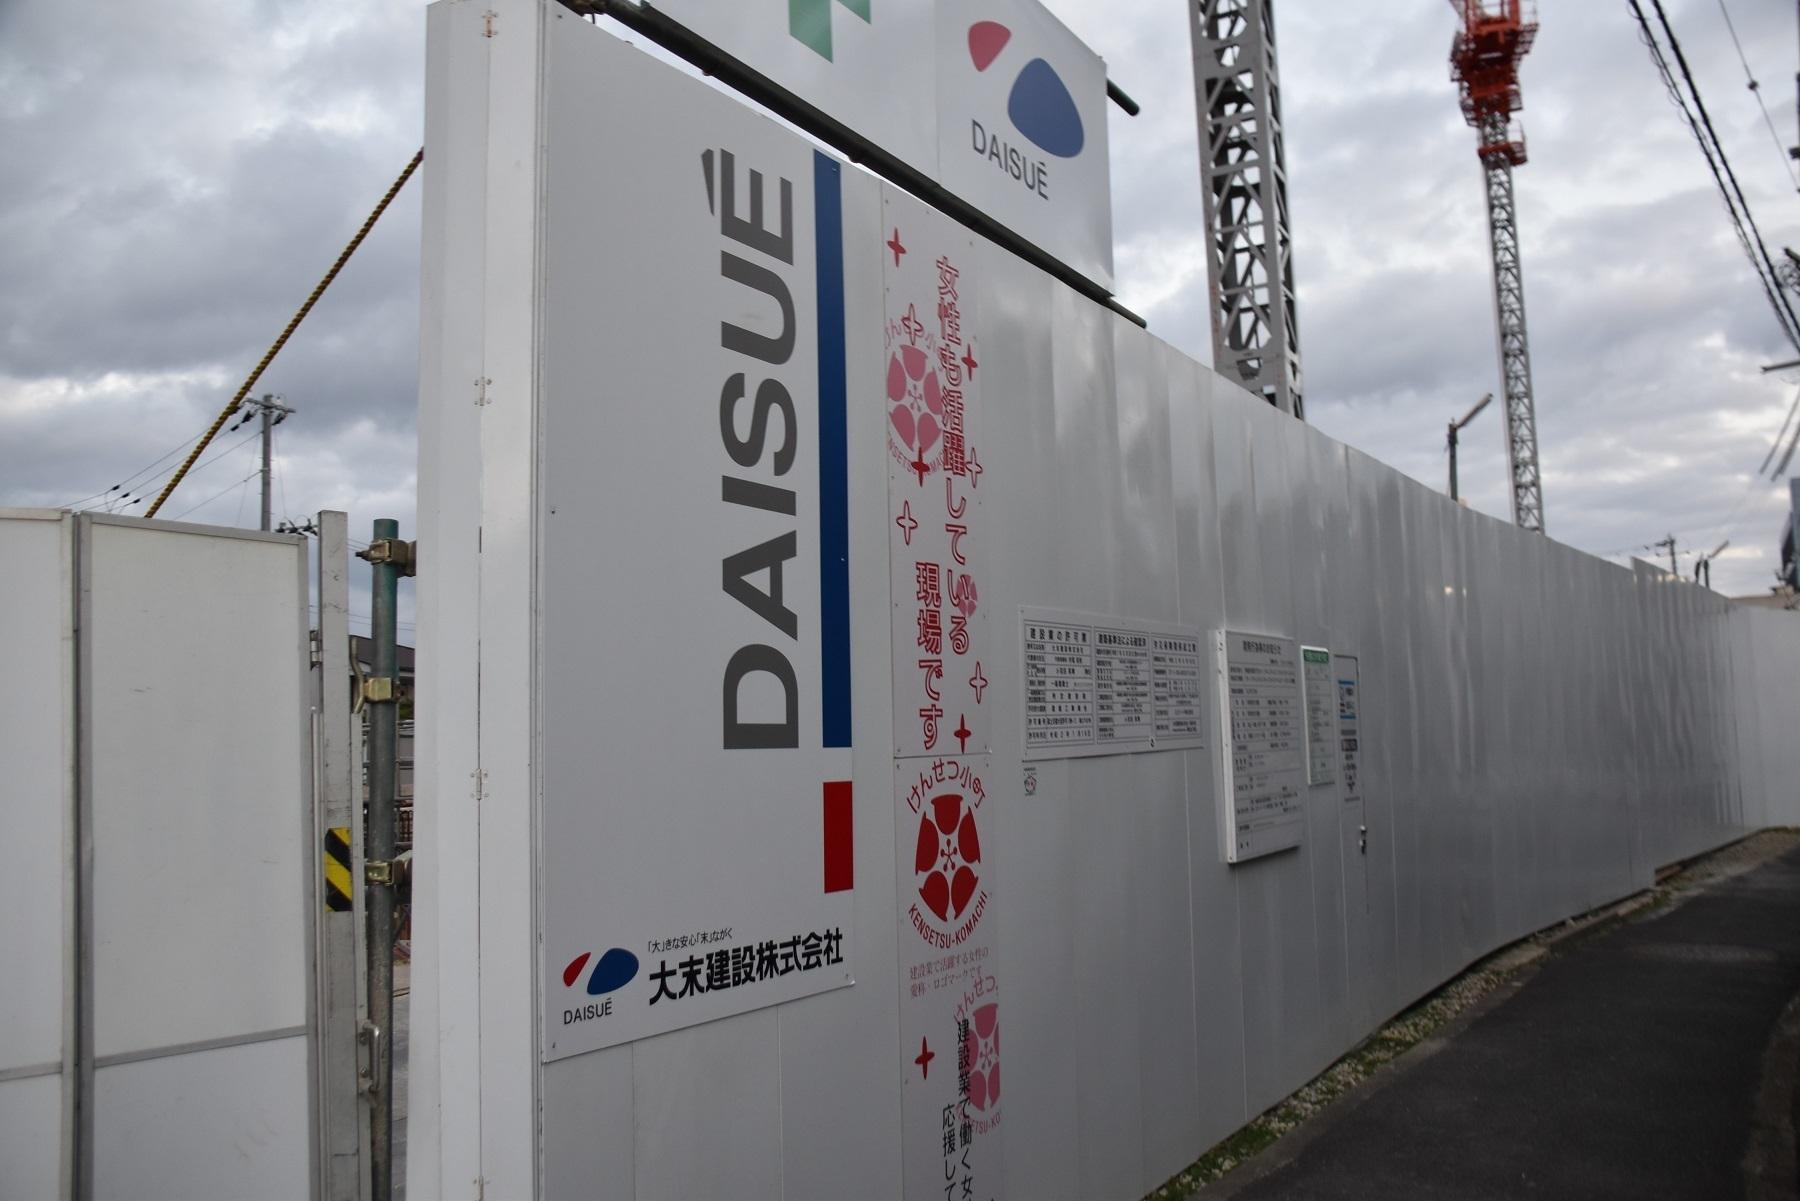 DSC_0843.JPG